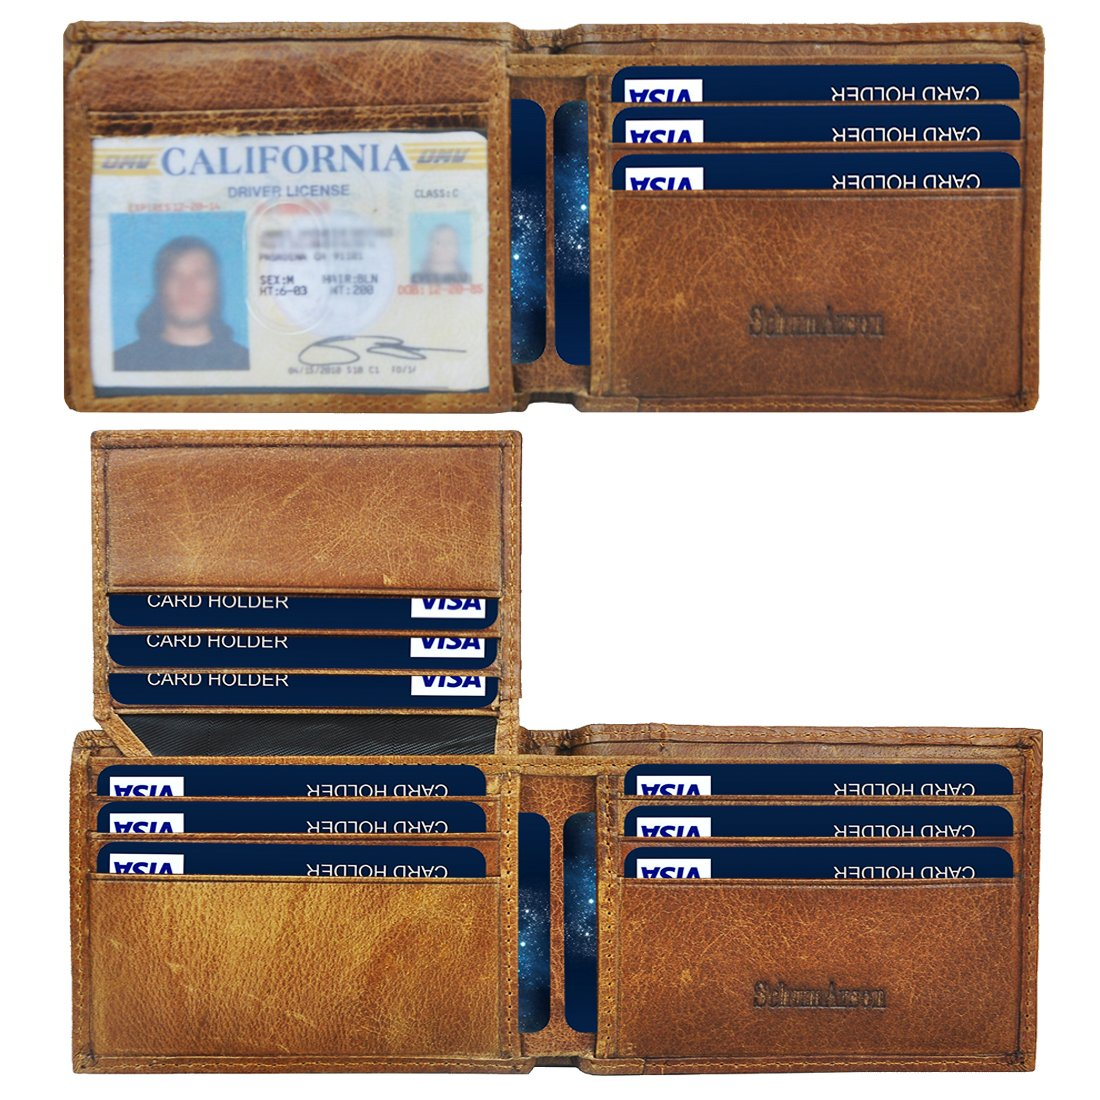 Mens Wallet, Schumarson RFID Blocking Bifold Genuine Leather Front Pocket Wallets for Men with Money Clip - Brown